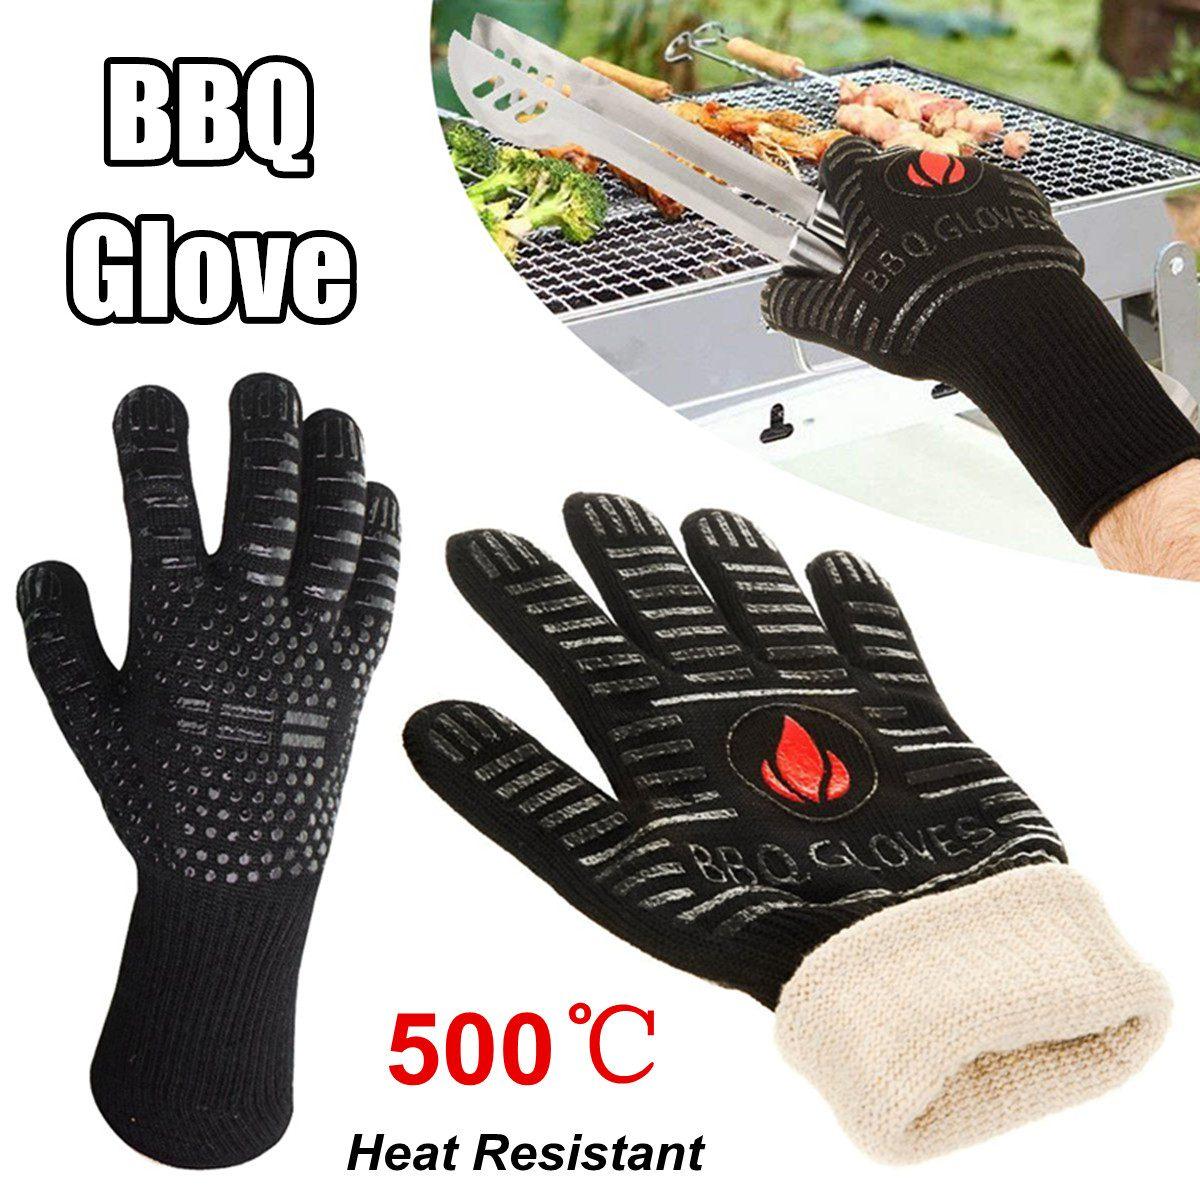 Guante de silicona para horno de 1 uds, guante de cocina resistente al calor, guantes de cocina multiusos para asar y cocinar, guantes para barbacoa